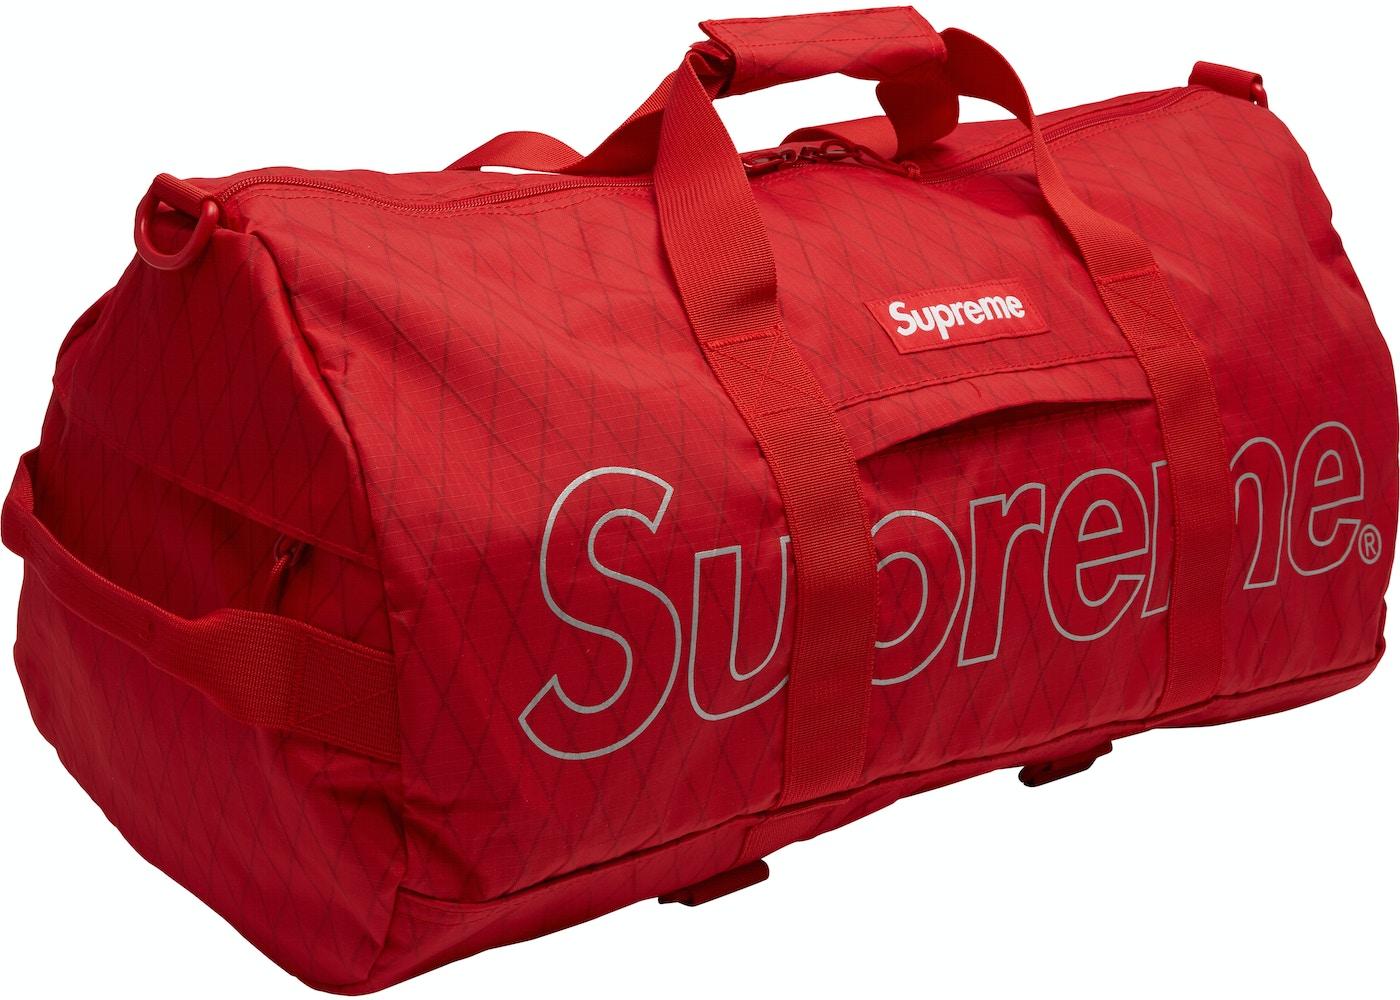 86da71ba87 Supreme Duffle Bag (FW18) Red. Duffle